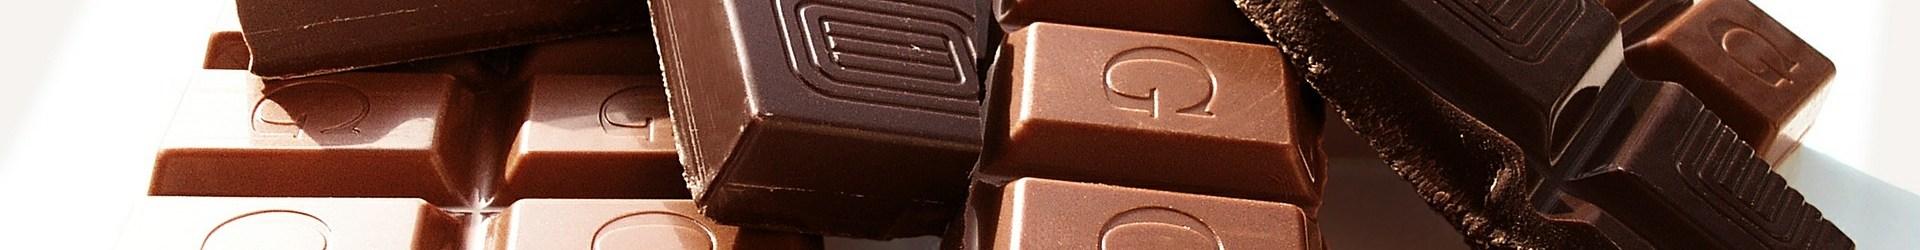 Sophro-Dégustation Chocolat en Pleine Conscience